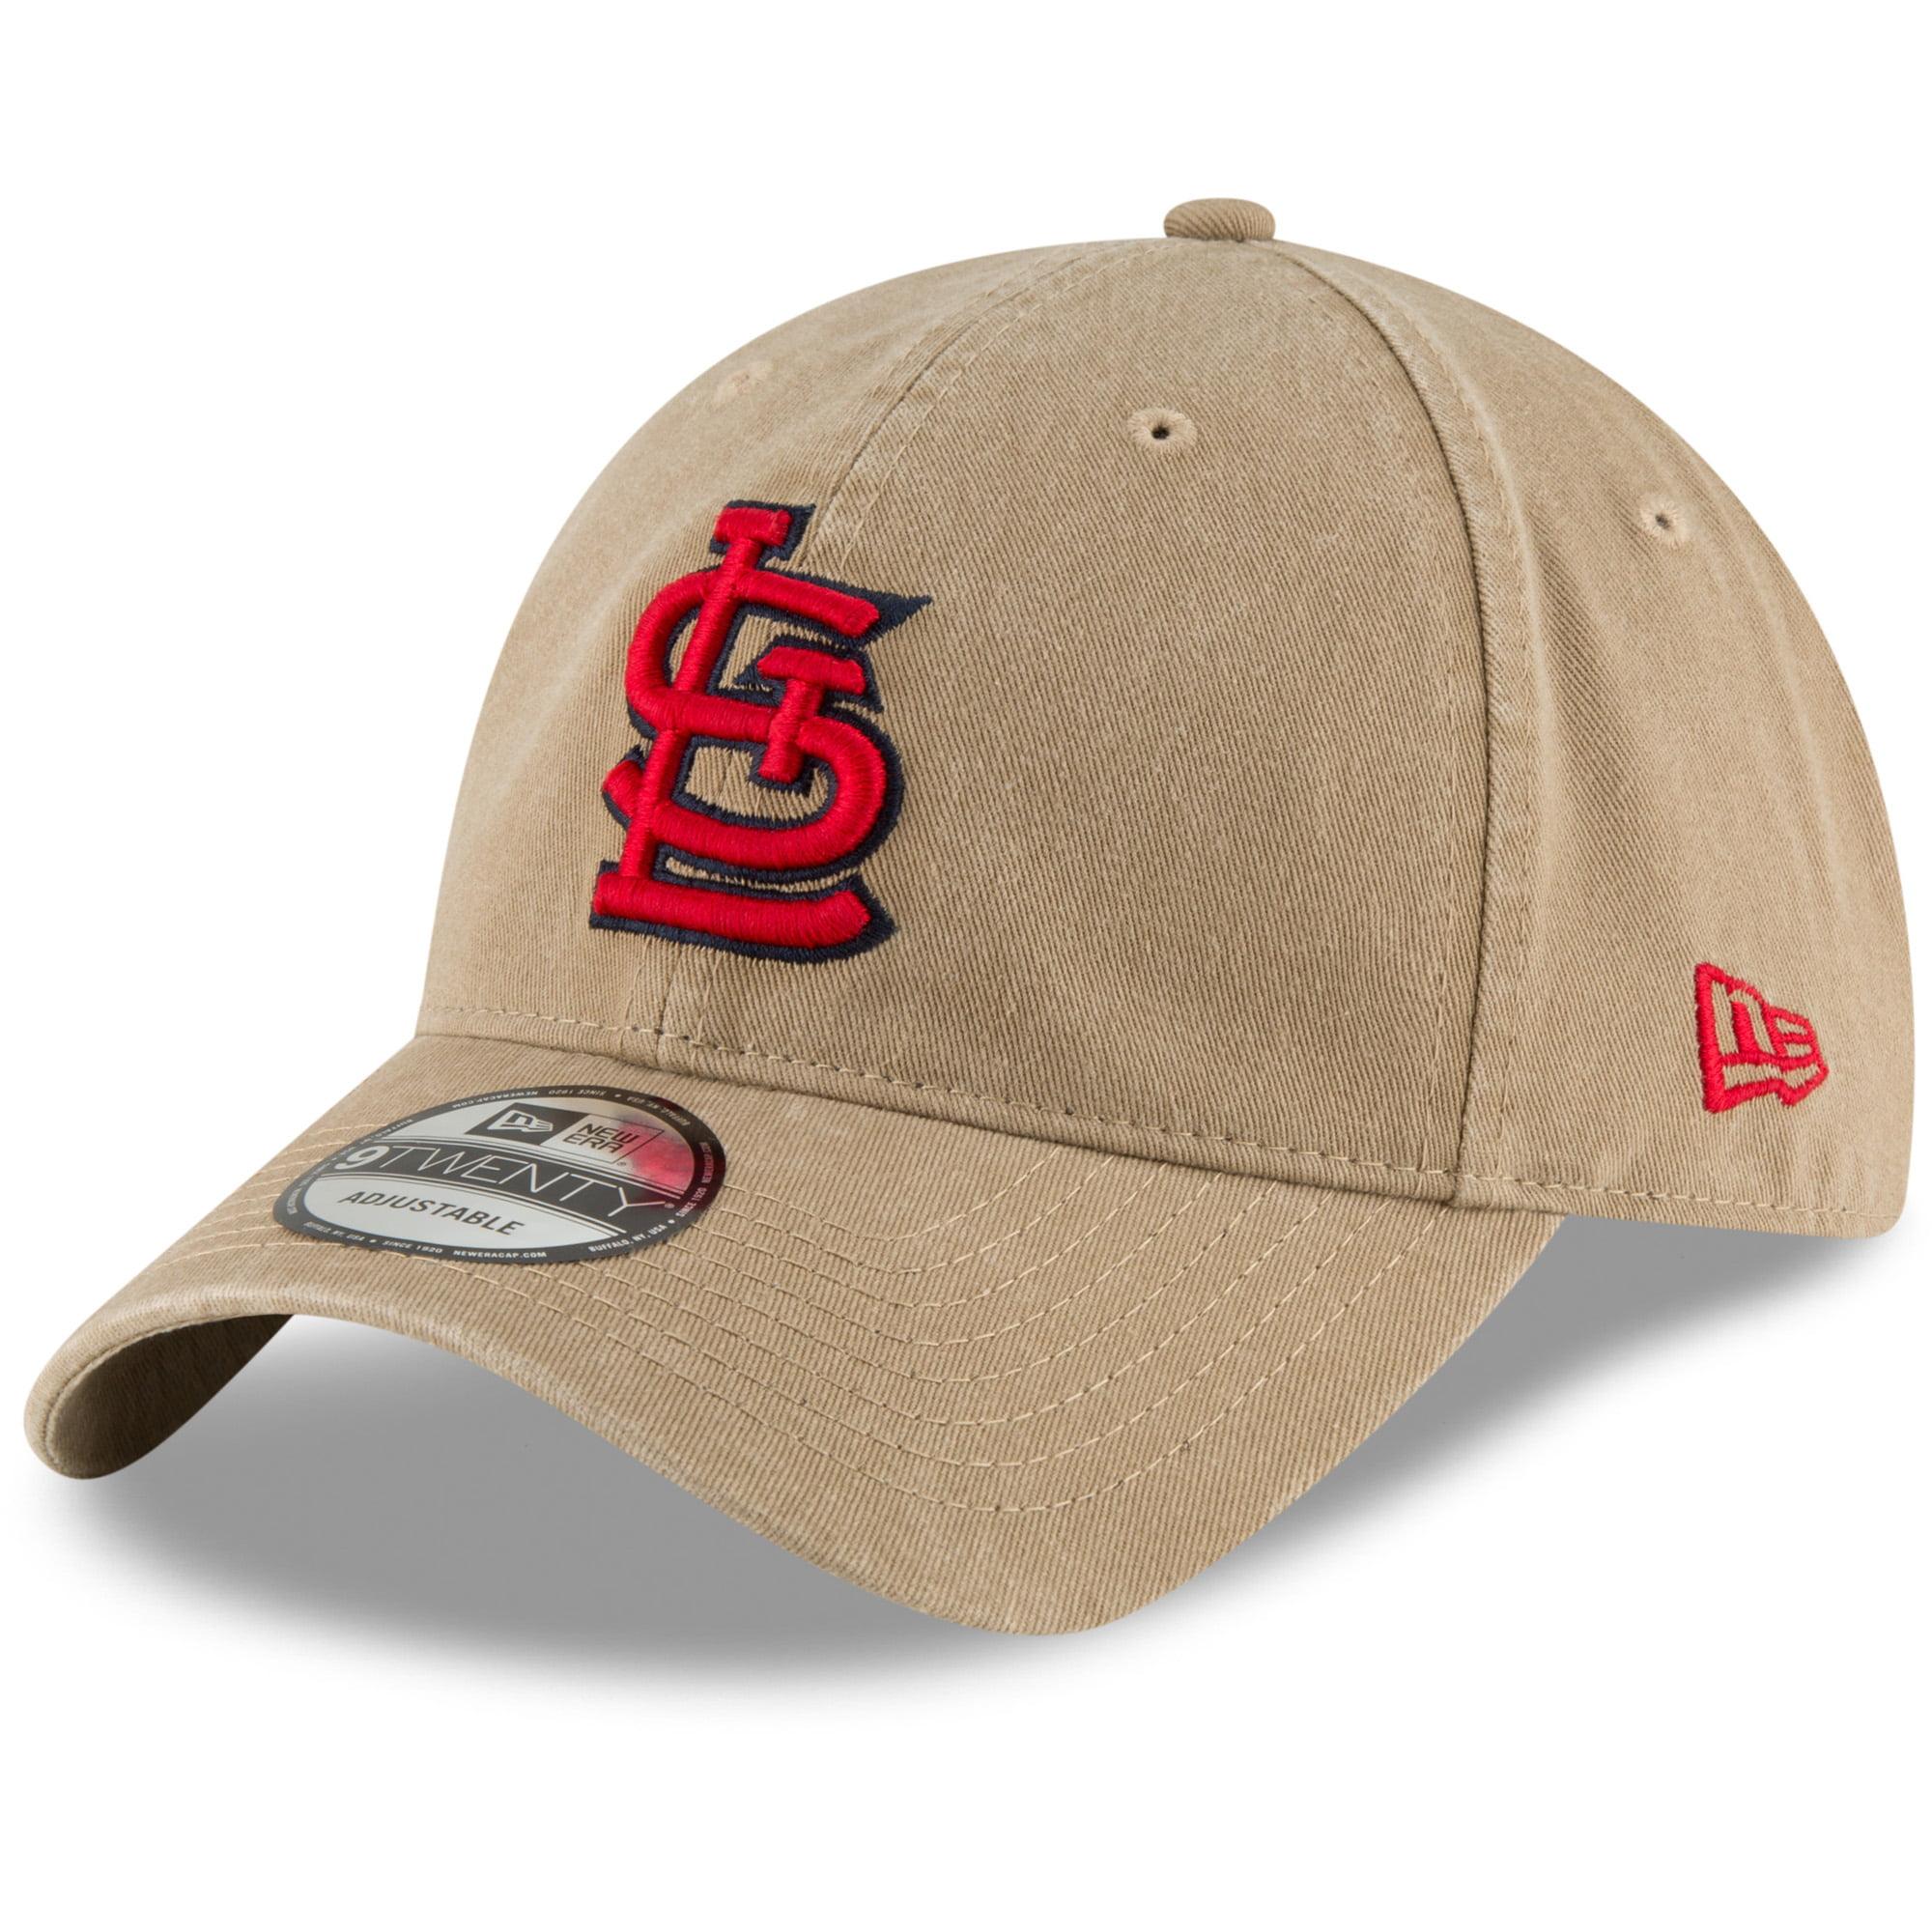 St. Louis Cardinals New Era Core Classic Secondary 9TWENTY Adjustable Hat - Khaki - OSFA